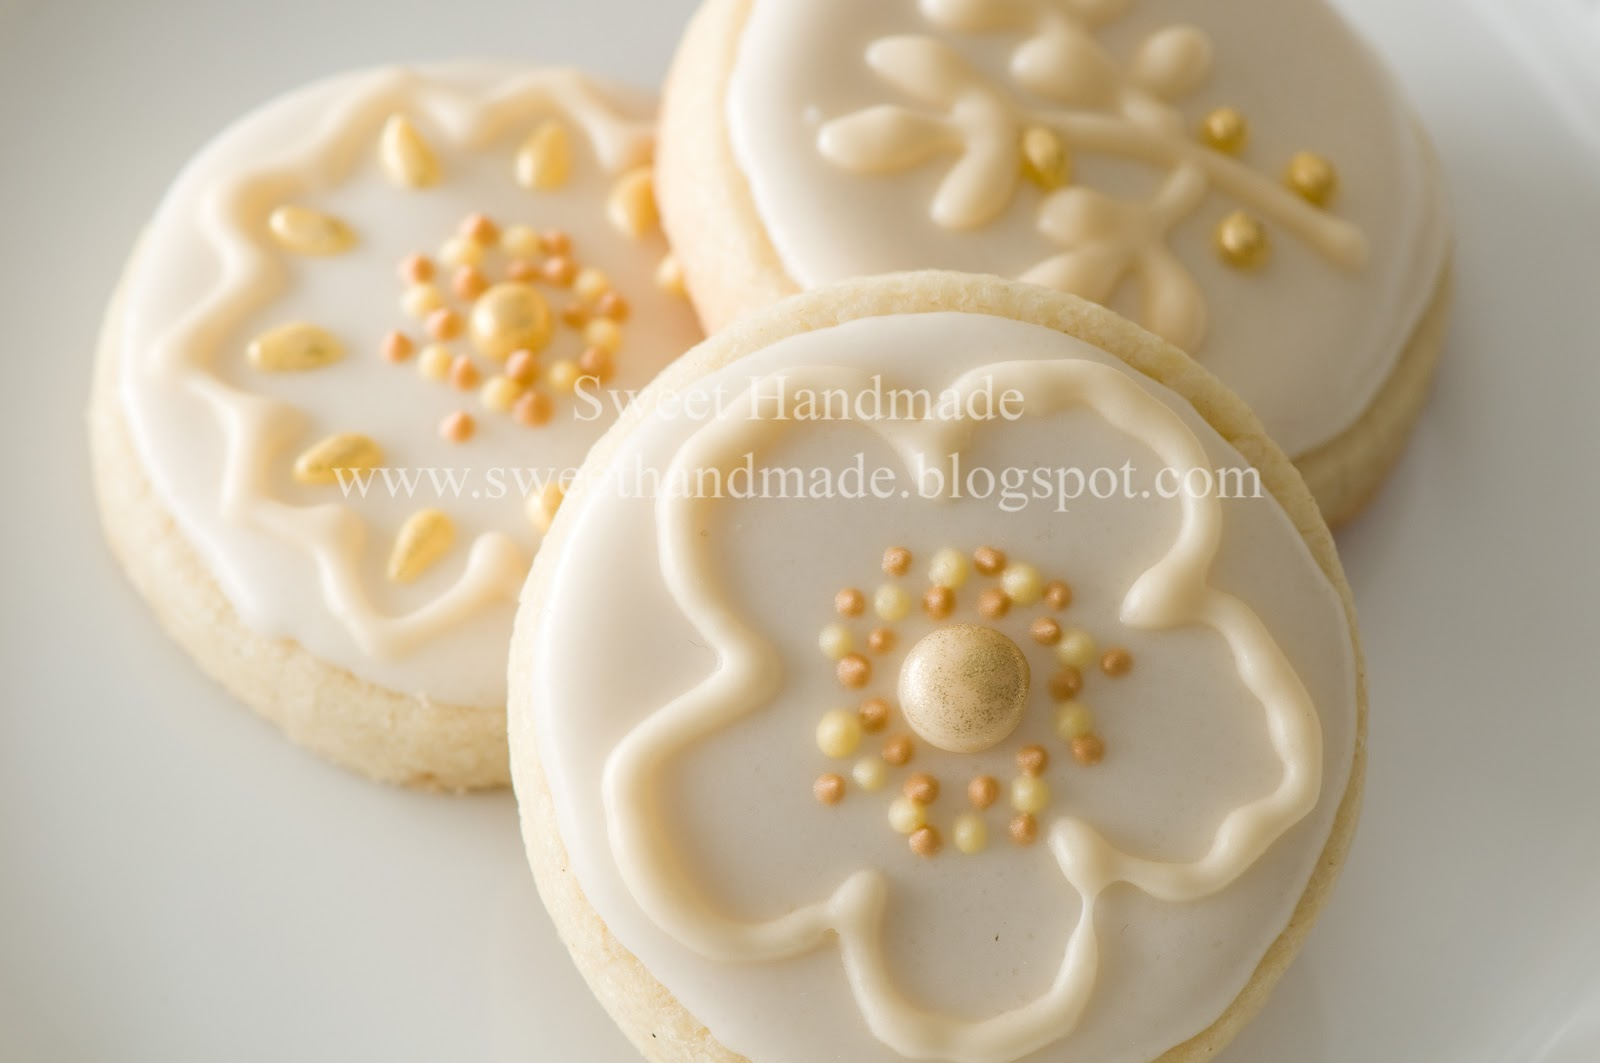 Sweet Handmade Cookies: Wedding Reception Cake & Cookies